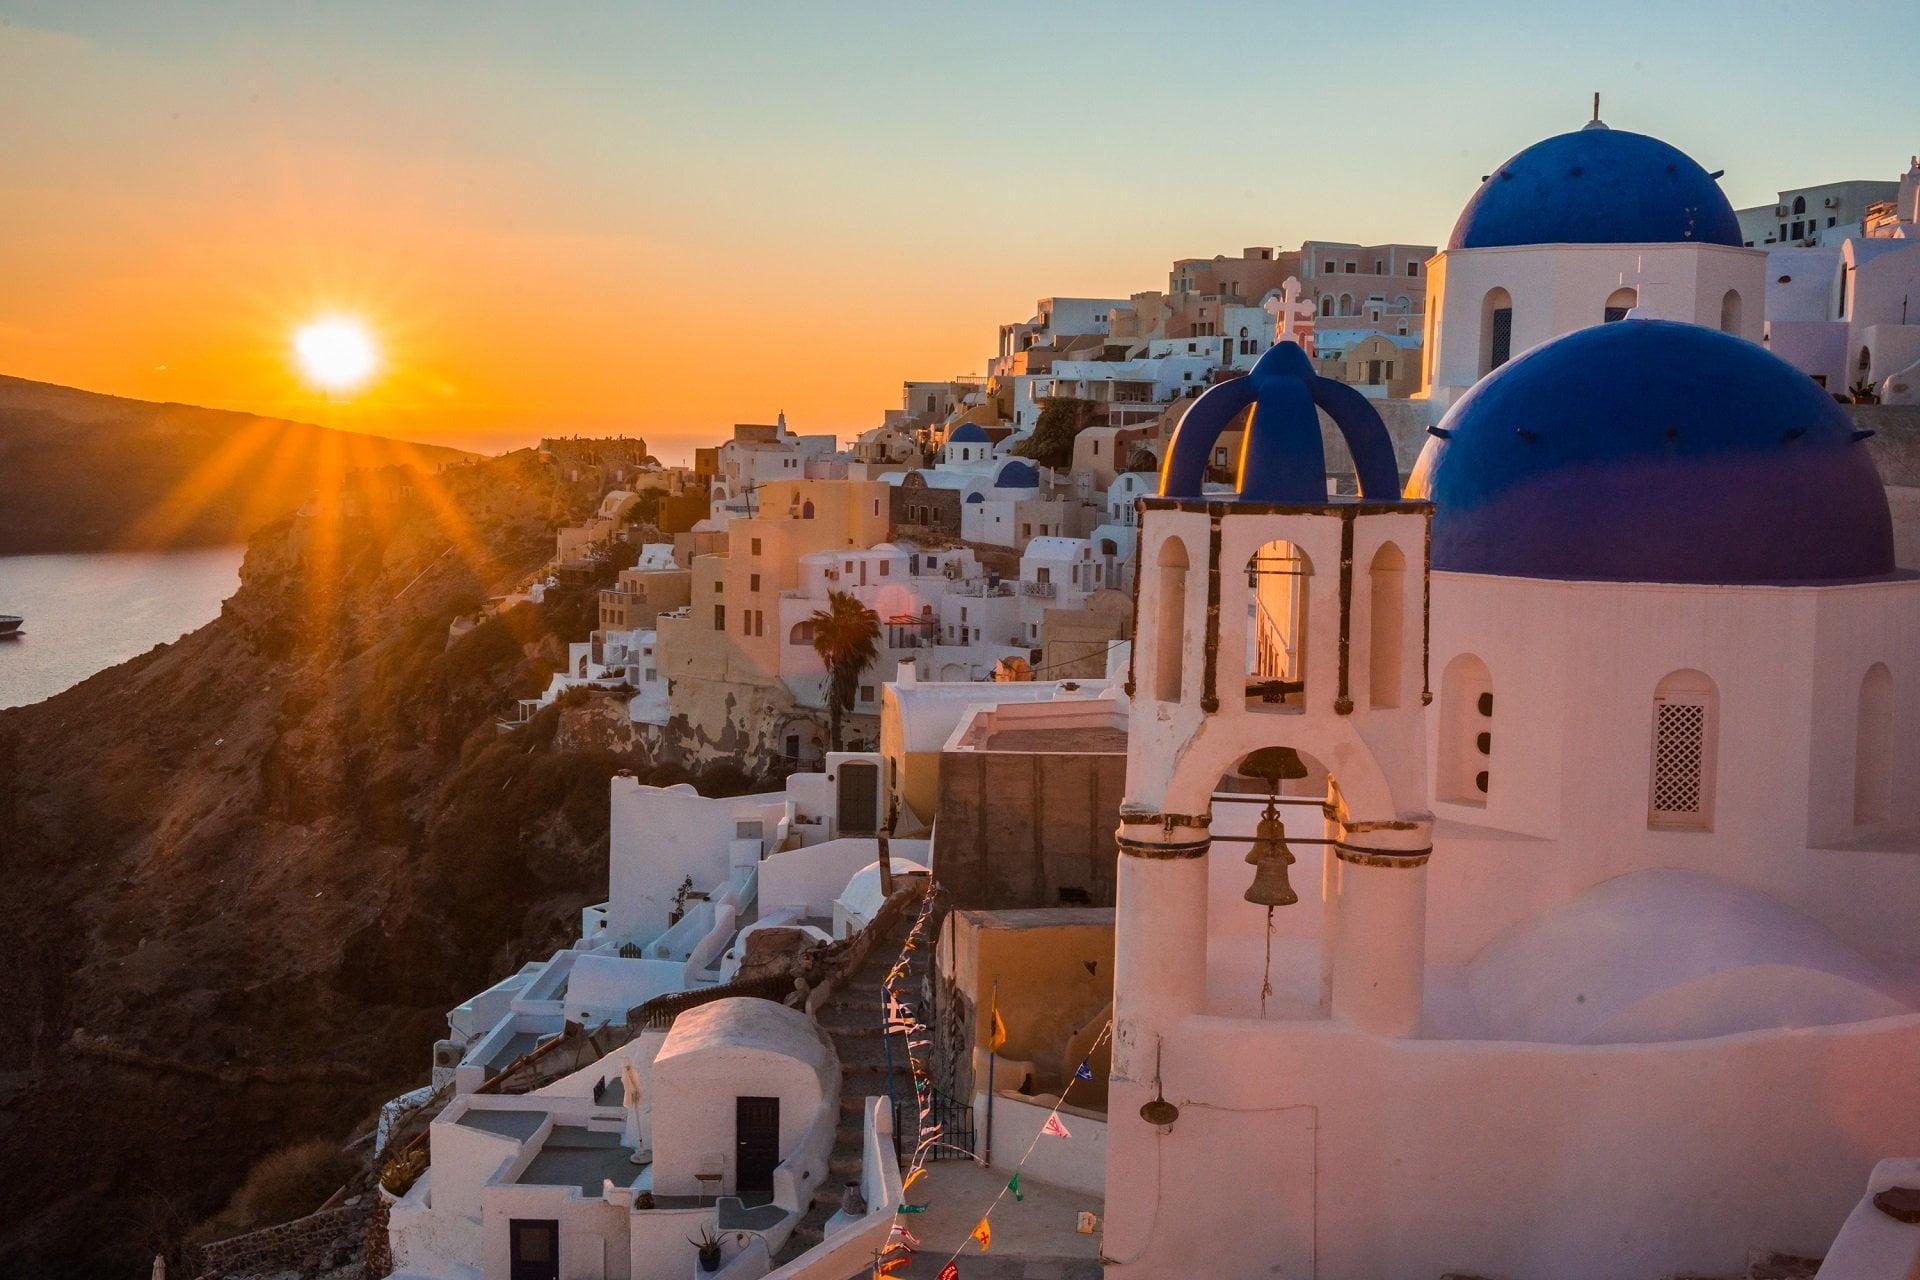 Turquía Egipto Y Grecia 18 Días De Tour